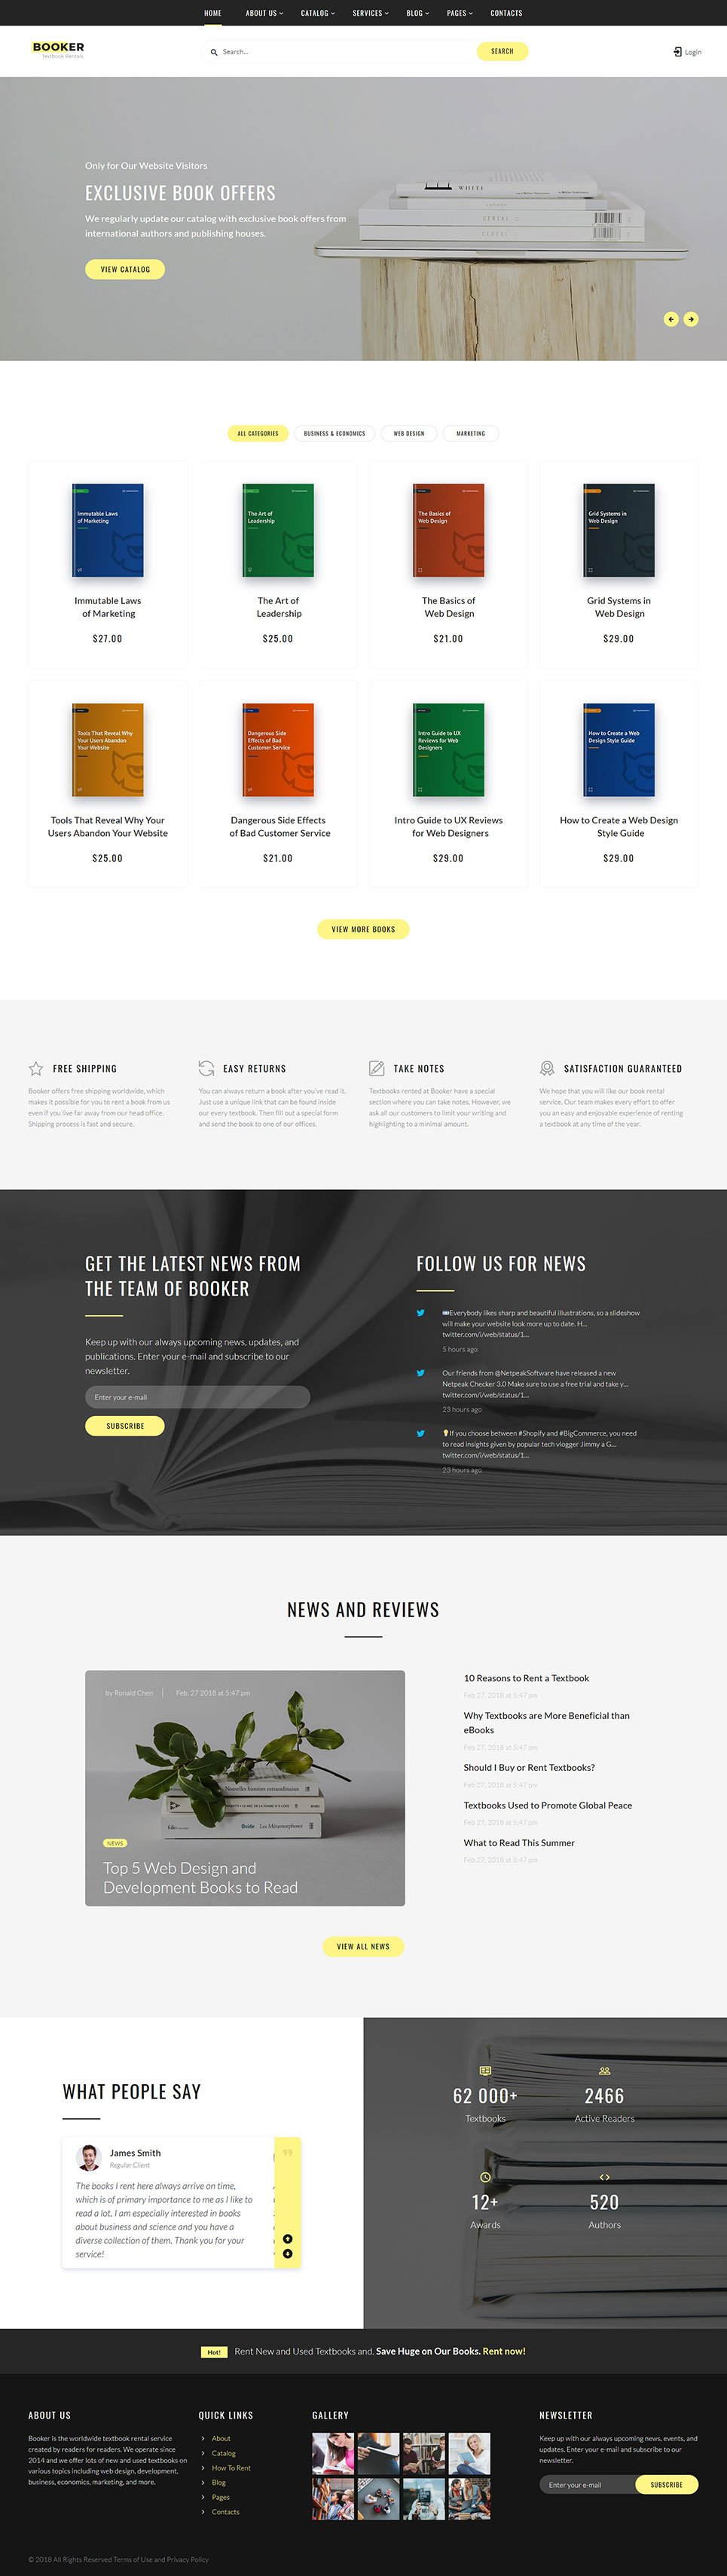 Books Responsive Website Template #54834